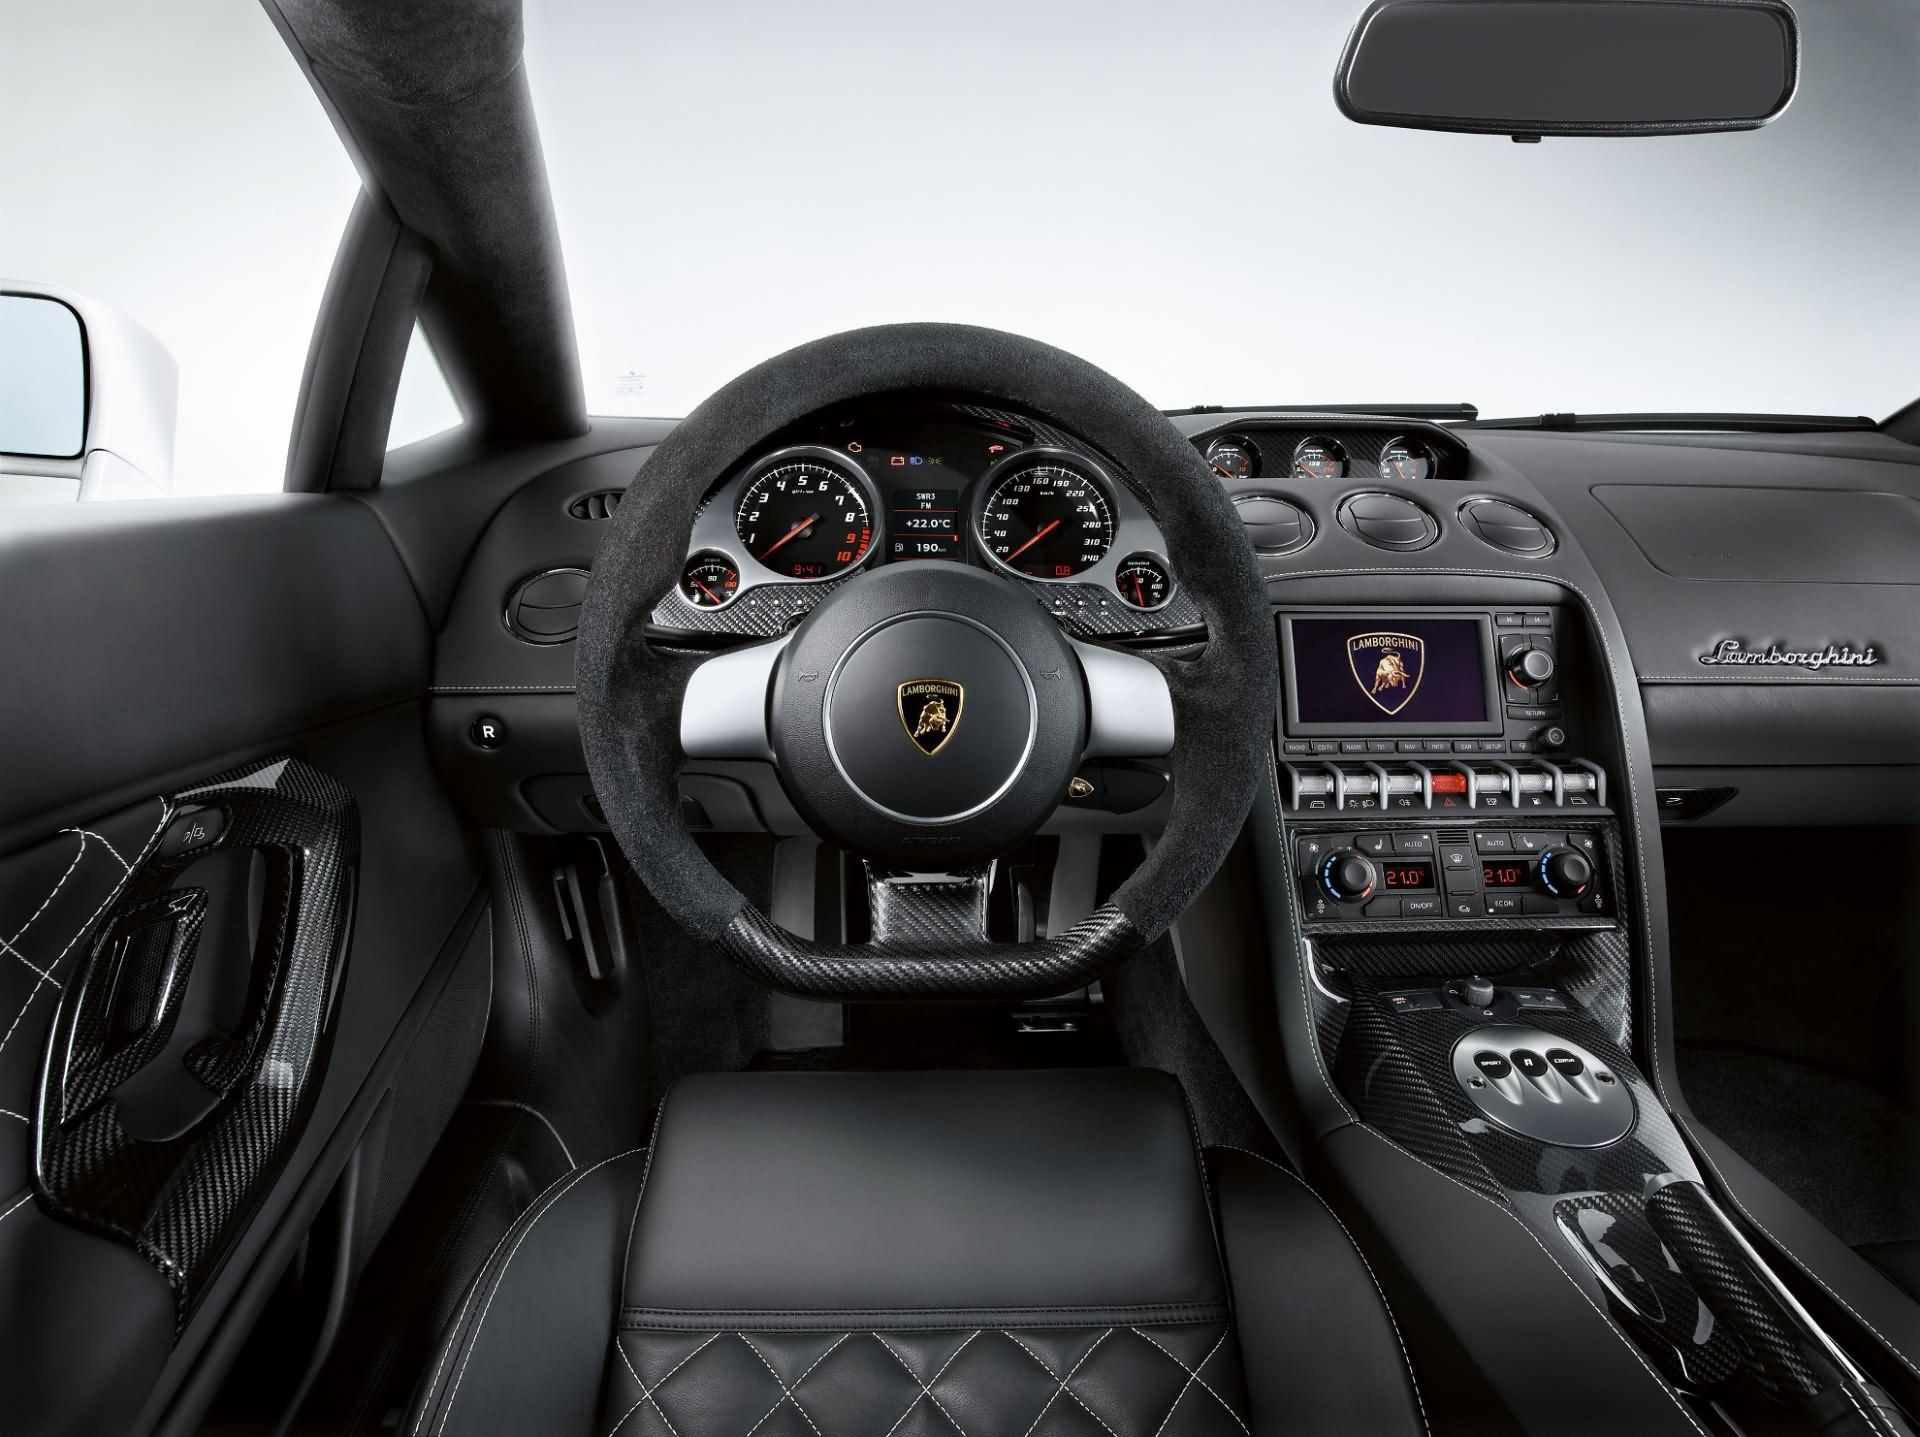 Lamborghini Gallardo LP 560-4 - Innenraum